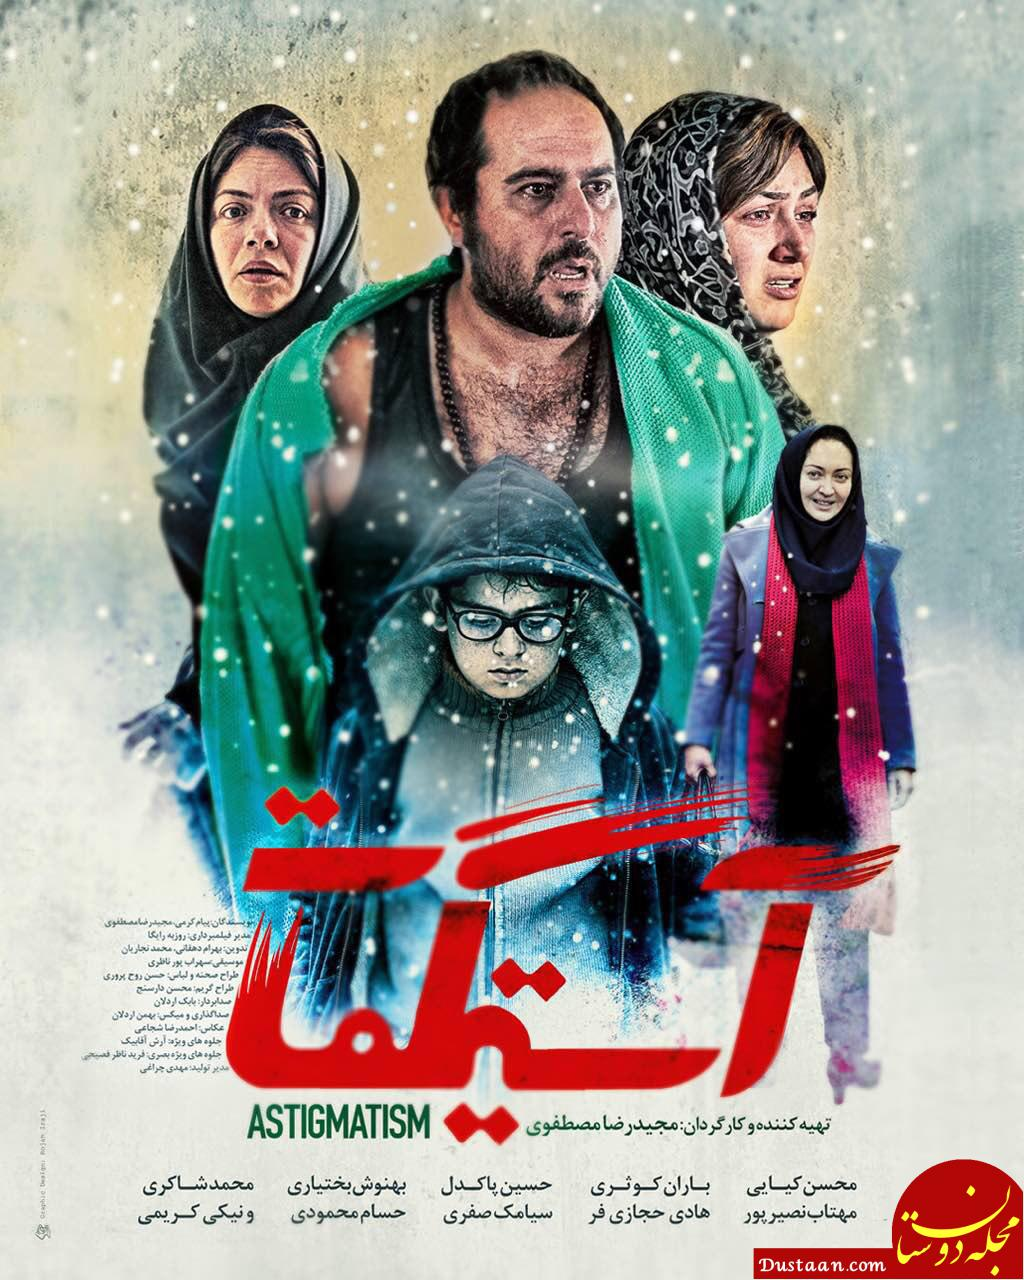 www.dustaan.com رونمایی از اولین پوستر فیلم سینمایی «آستیگمات» +عکس